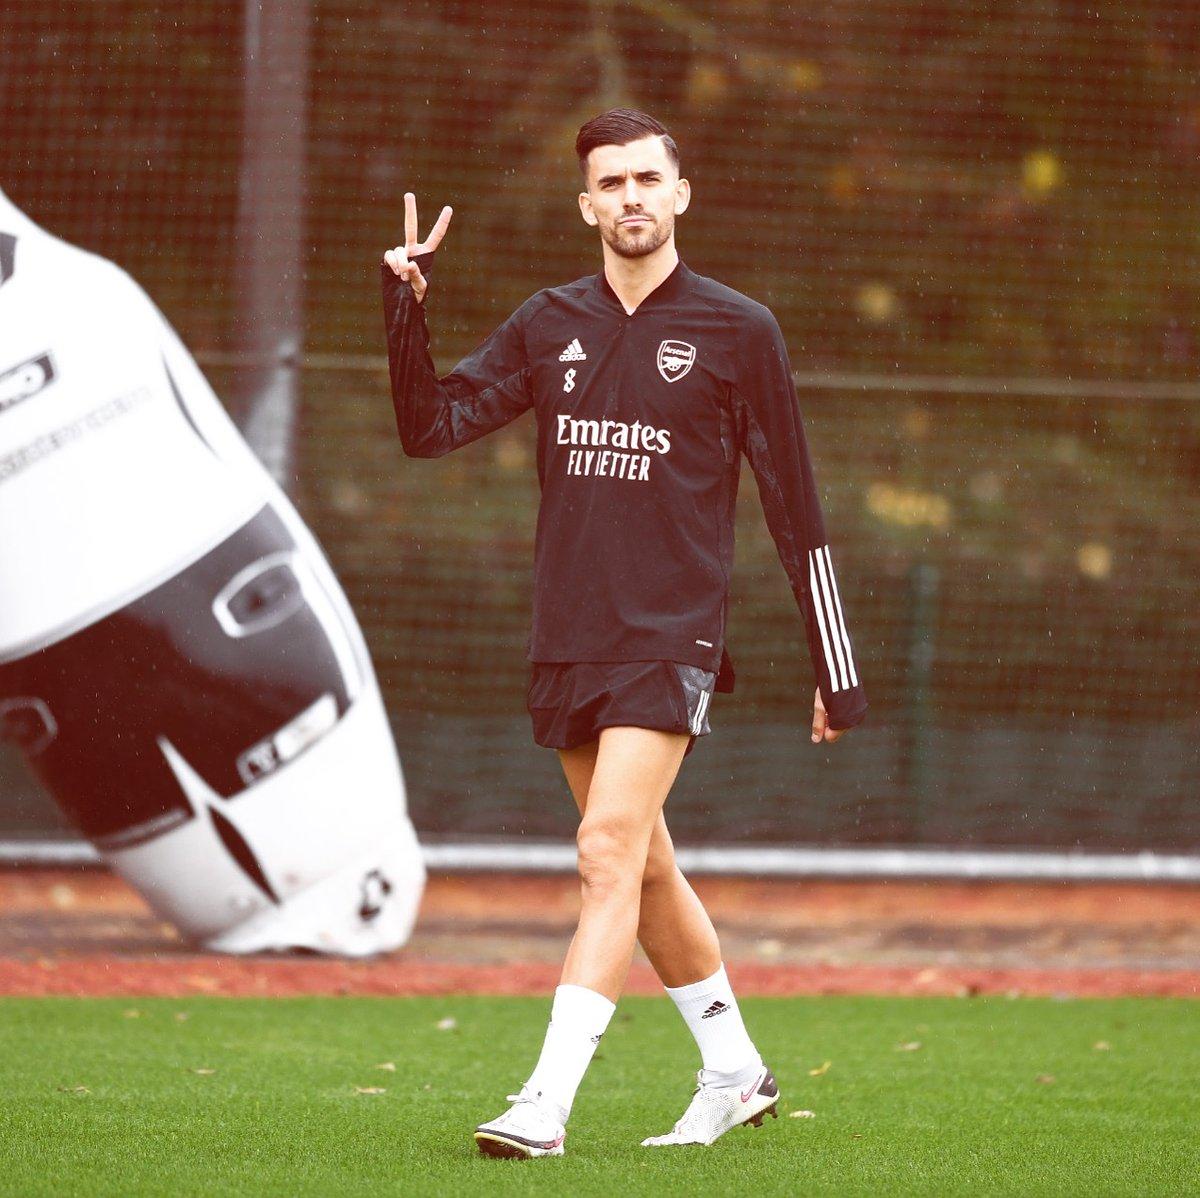 🔴⚪️ Always ✌🏻😏  @Arsenal #TrainingDay #Attitude #Optimism #Trust #Gunners #VamosGunners